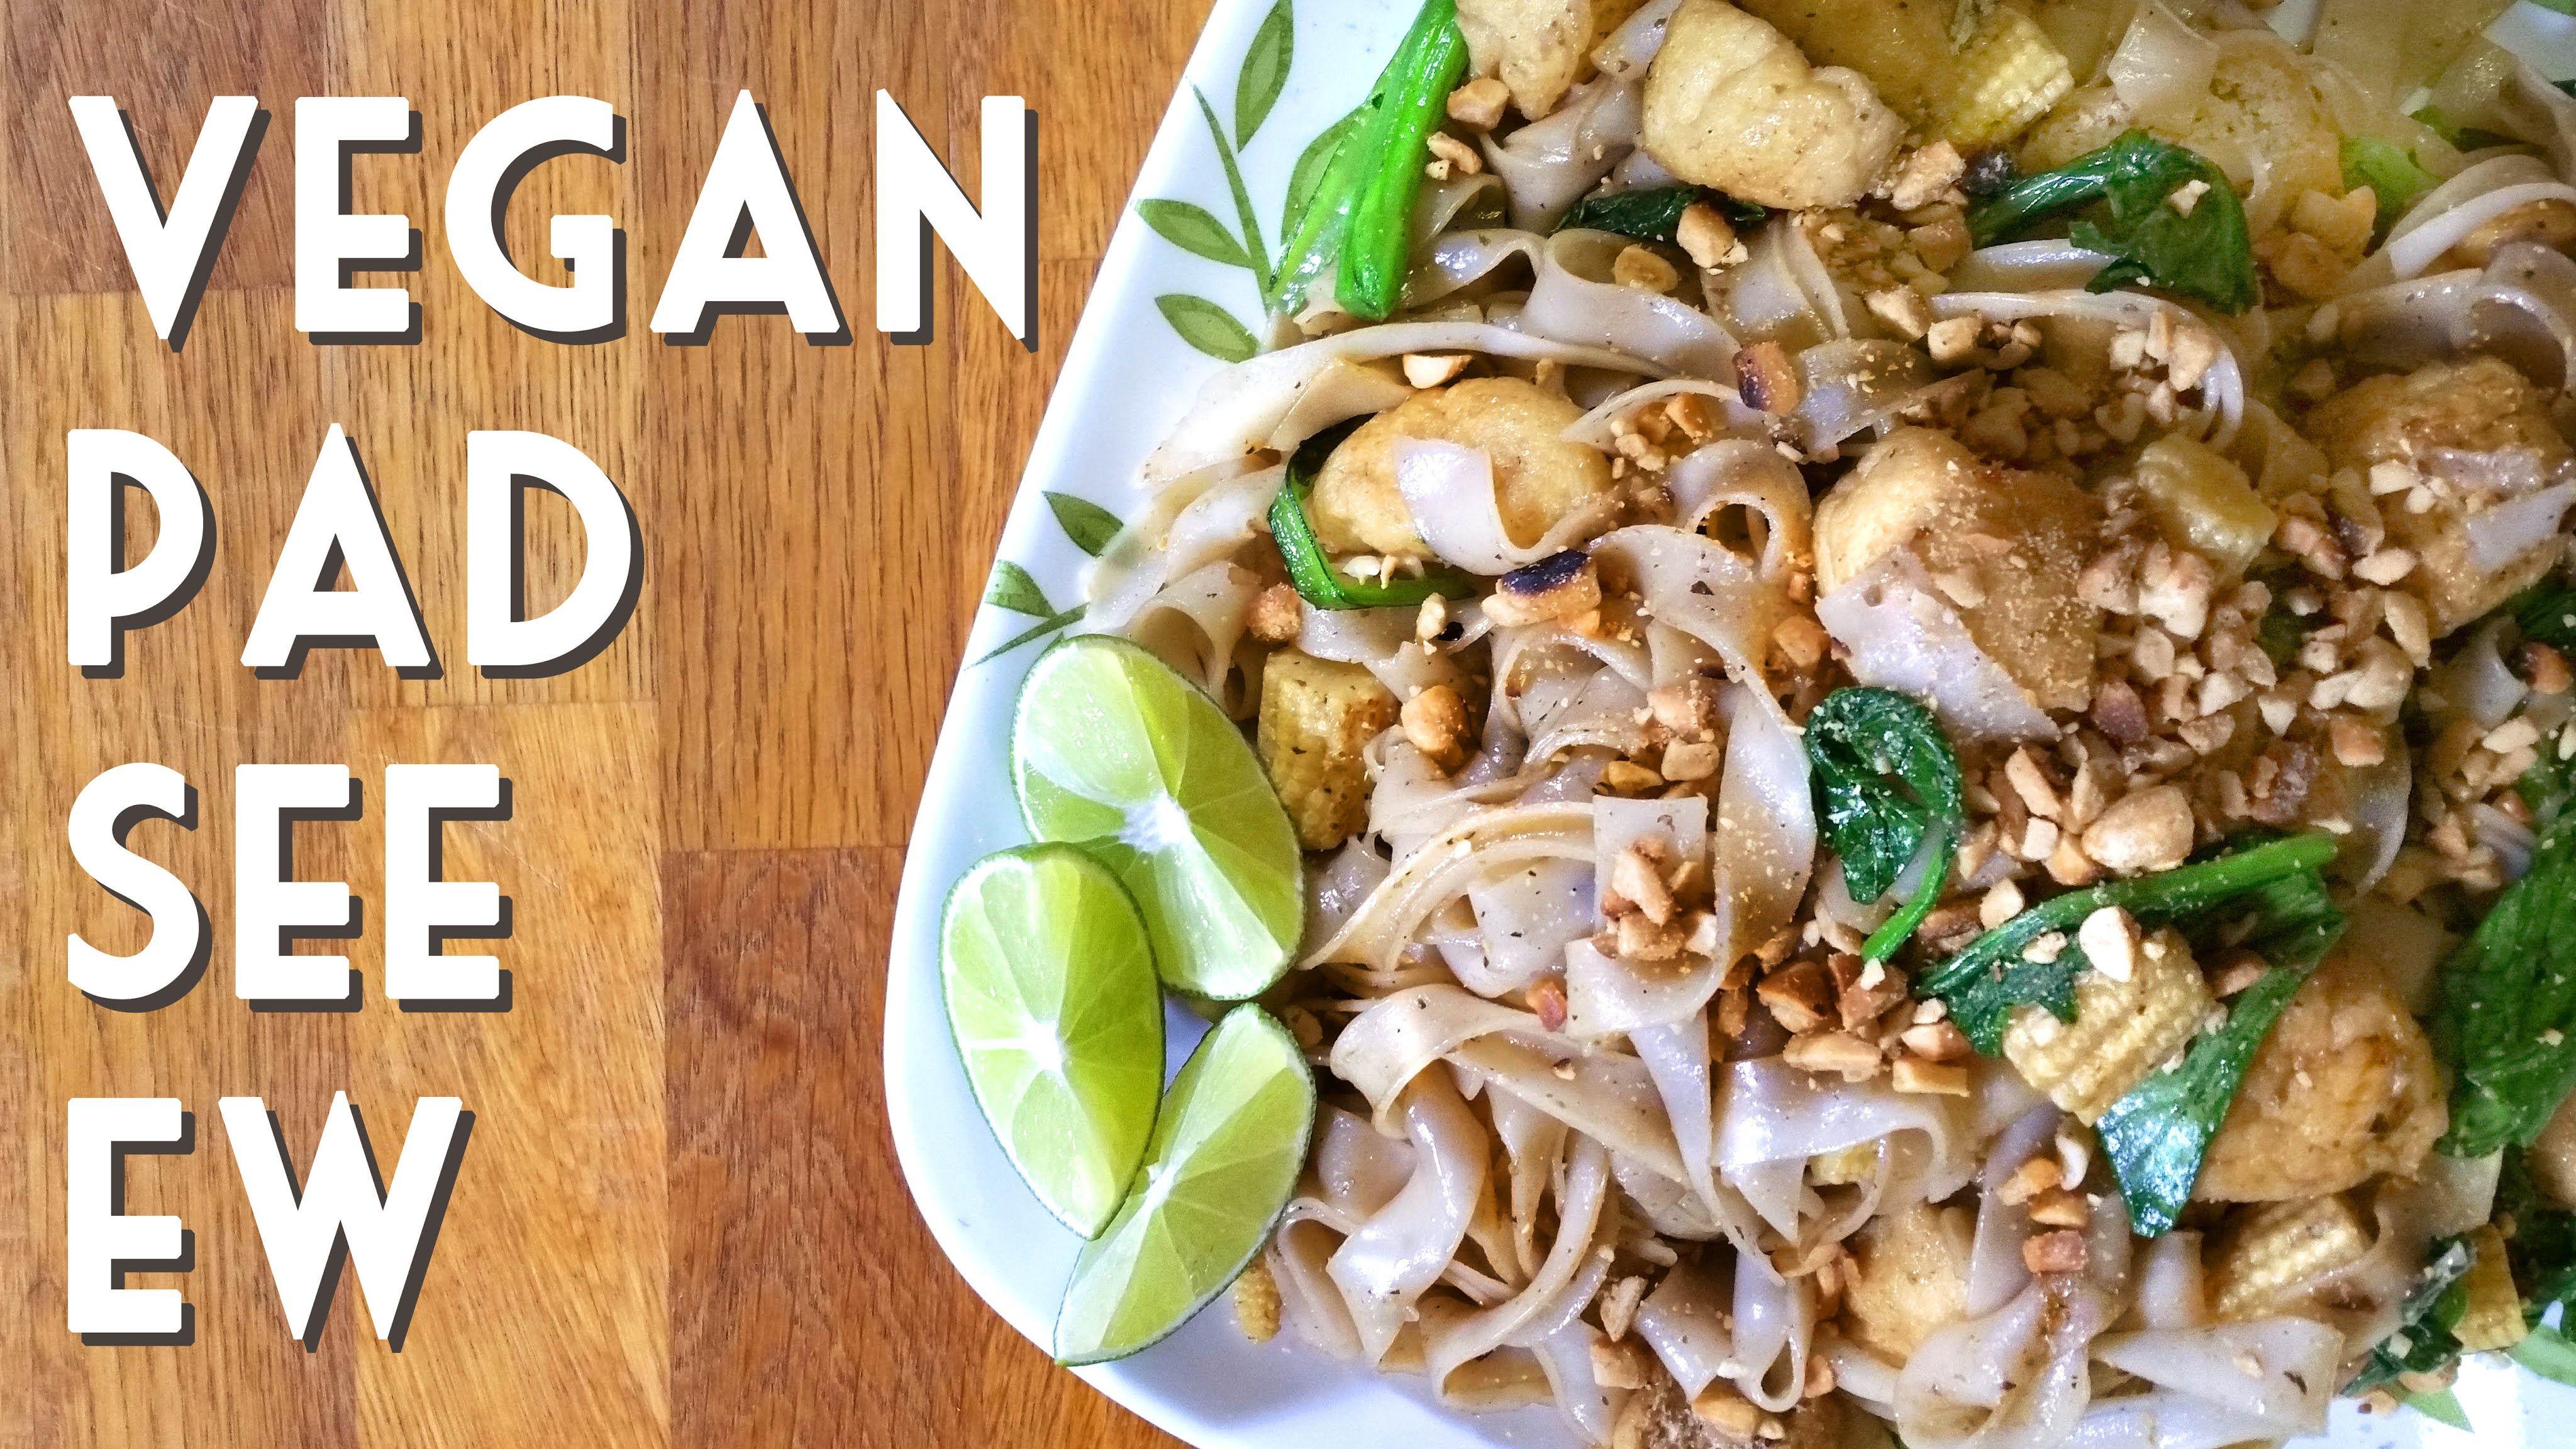 Vegan pad see ew thai stir fry noodle recipe vegan plant based new recipe video for you guys vegan thai pad see ew forumfinder Gallery